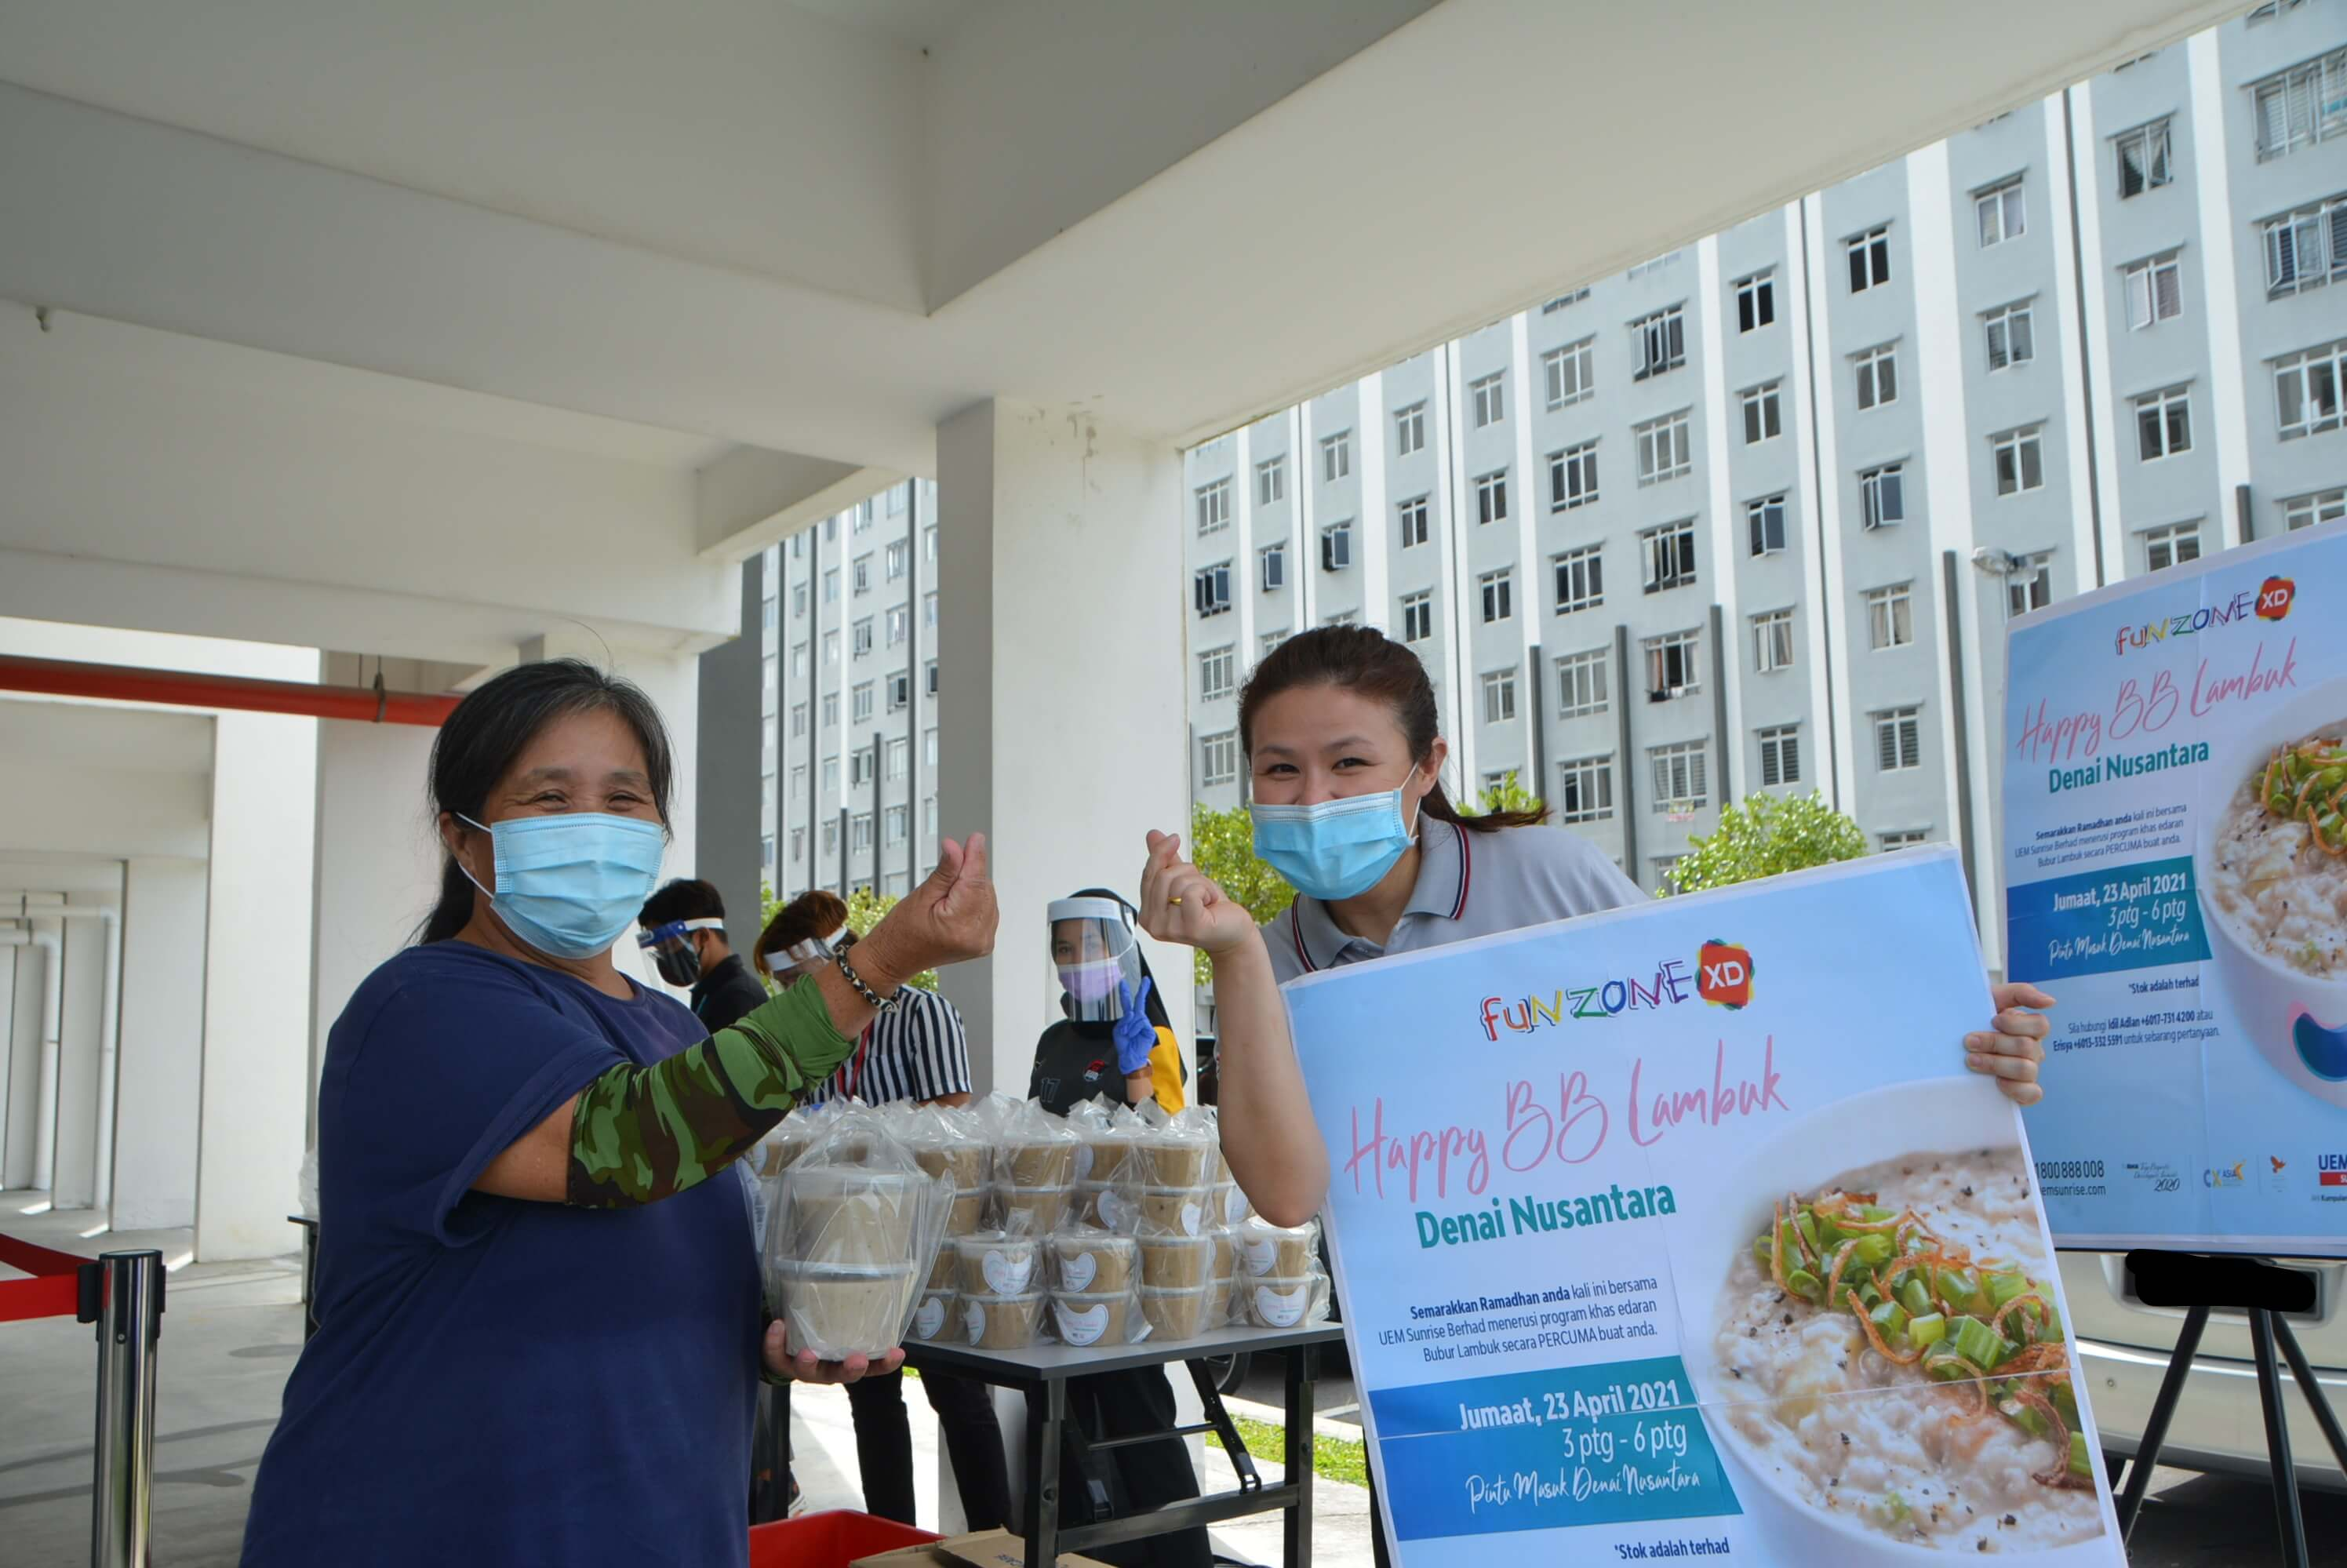 UEM Sunrise Shares Delicious Happy BB Lambuk With Denai Nusantara Community